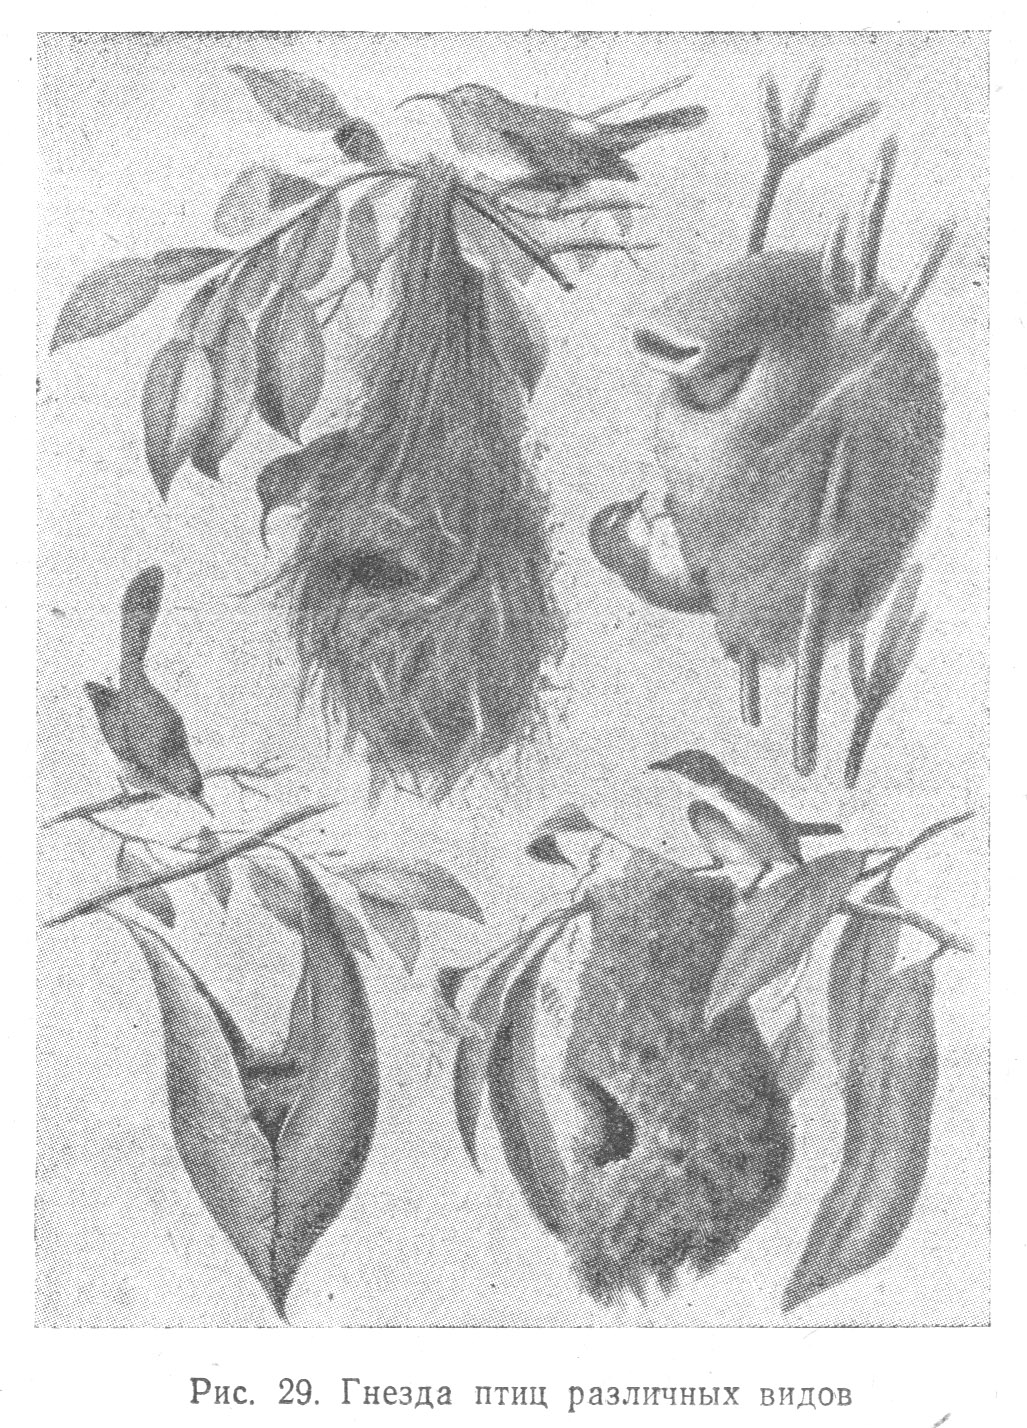 Гнезда птиц (птенцы и взрослые) - Птицы.